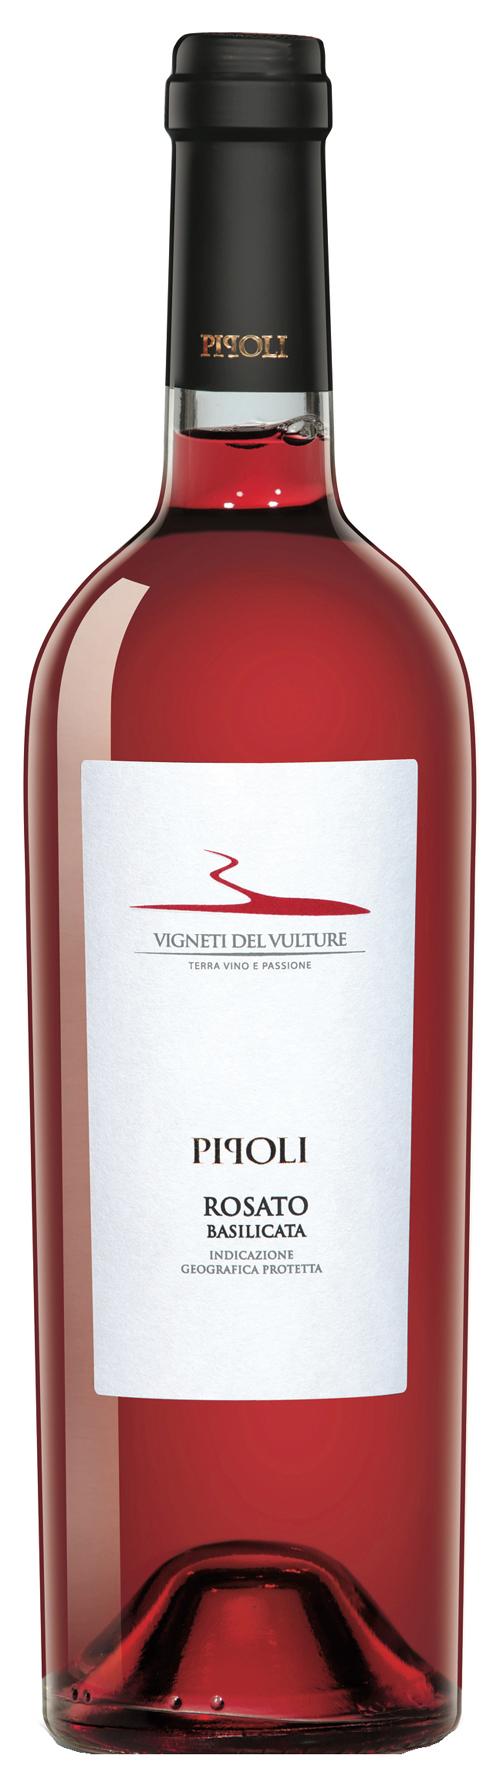 2015 Pipoli Rosato Basilicata IGT VIGNETI DEL VULTURE